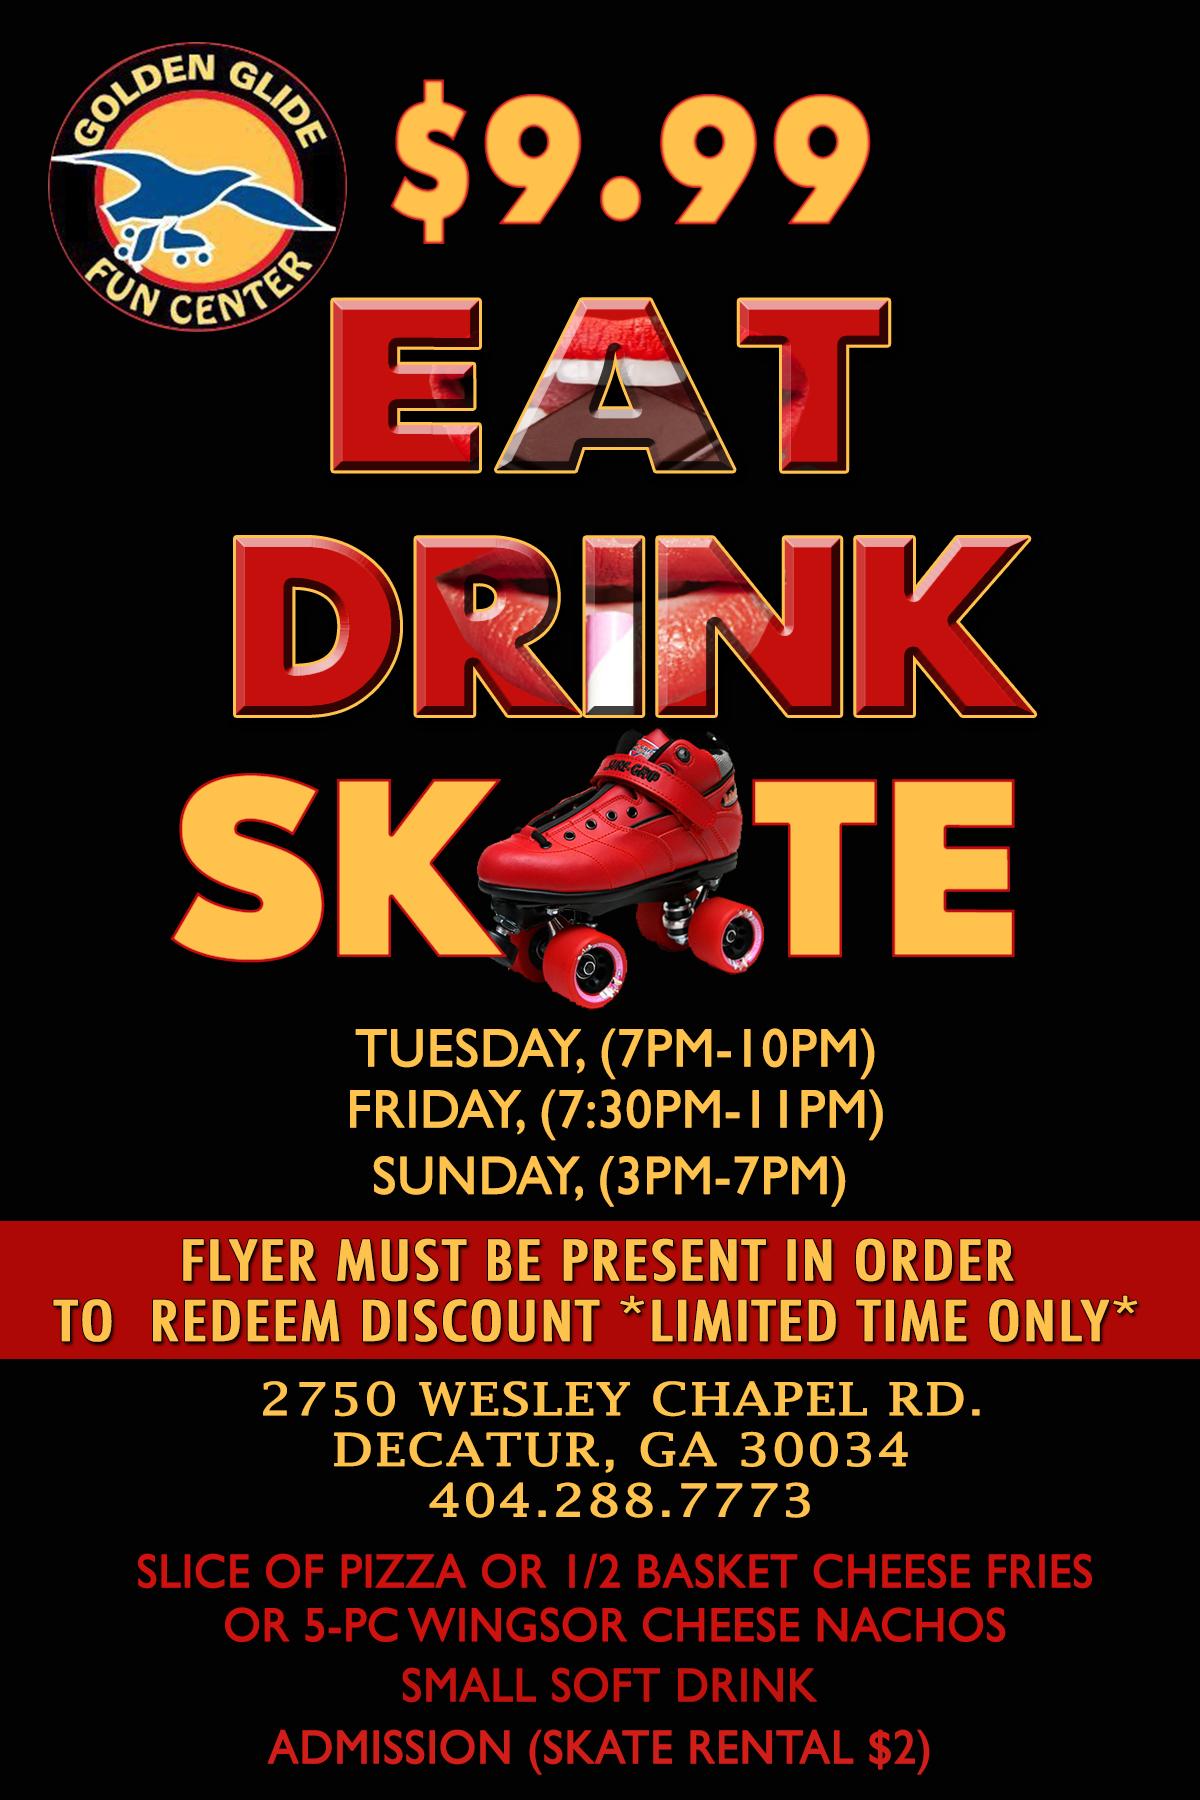 eat drink skate $9.99